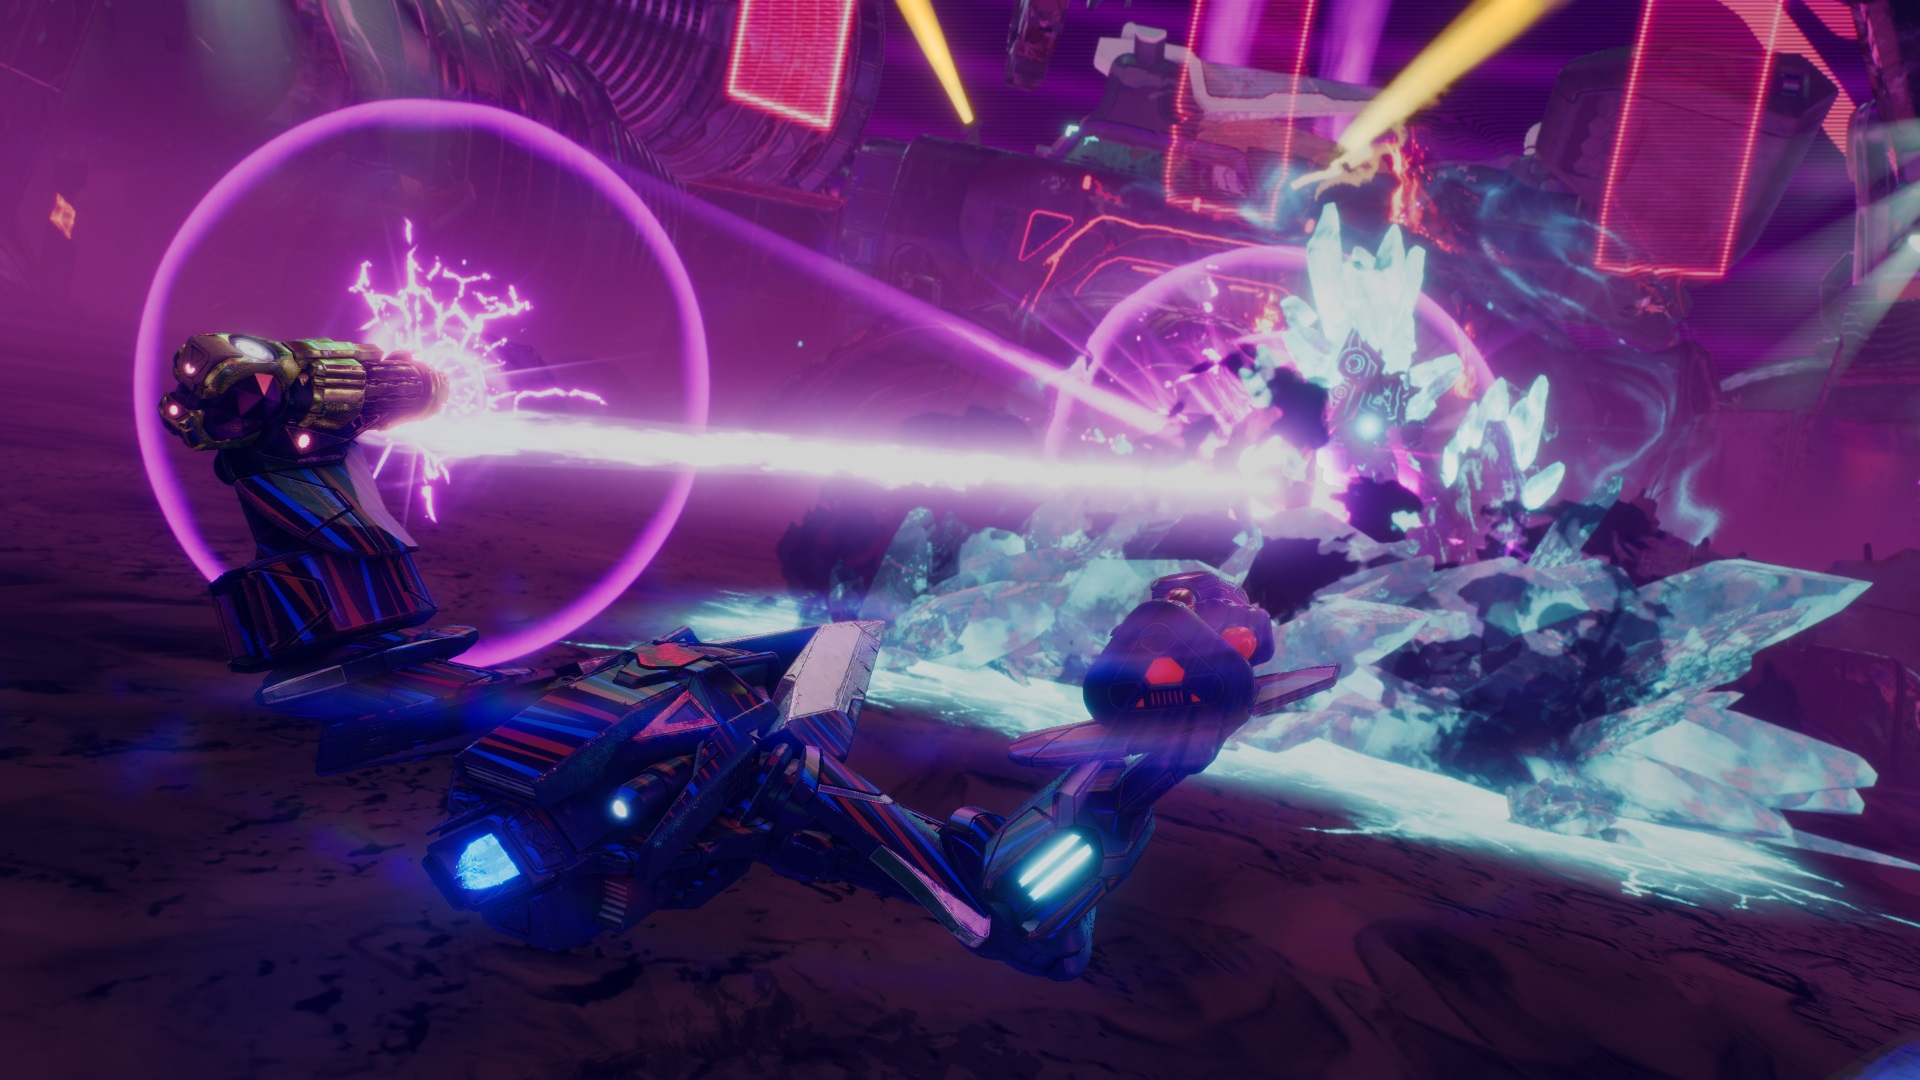 Starlink: Battle for Atlas takes flight on PC next week screenshot